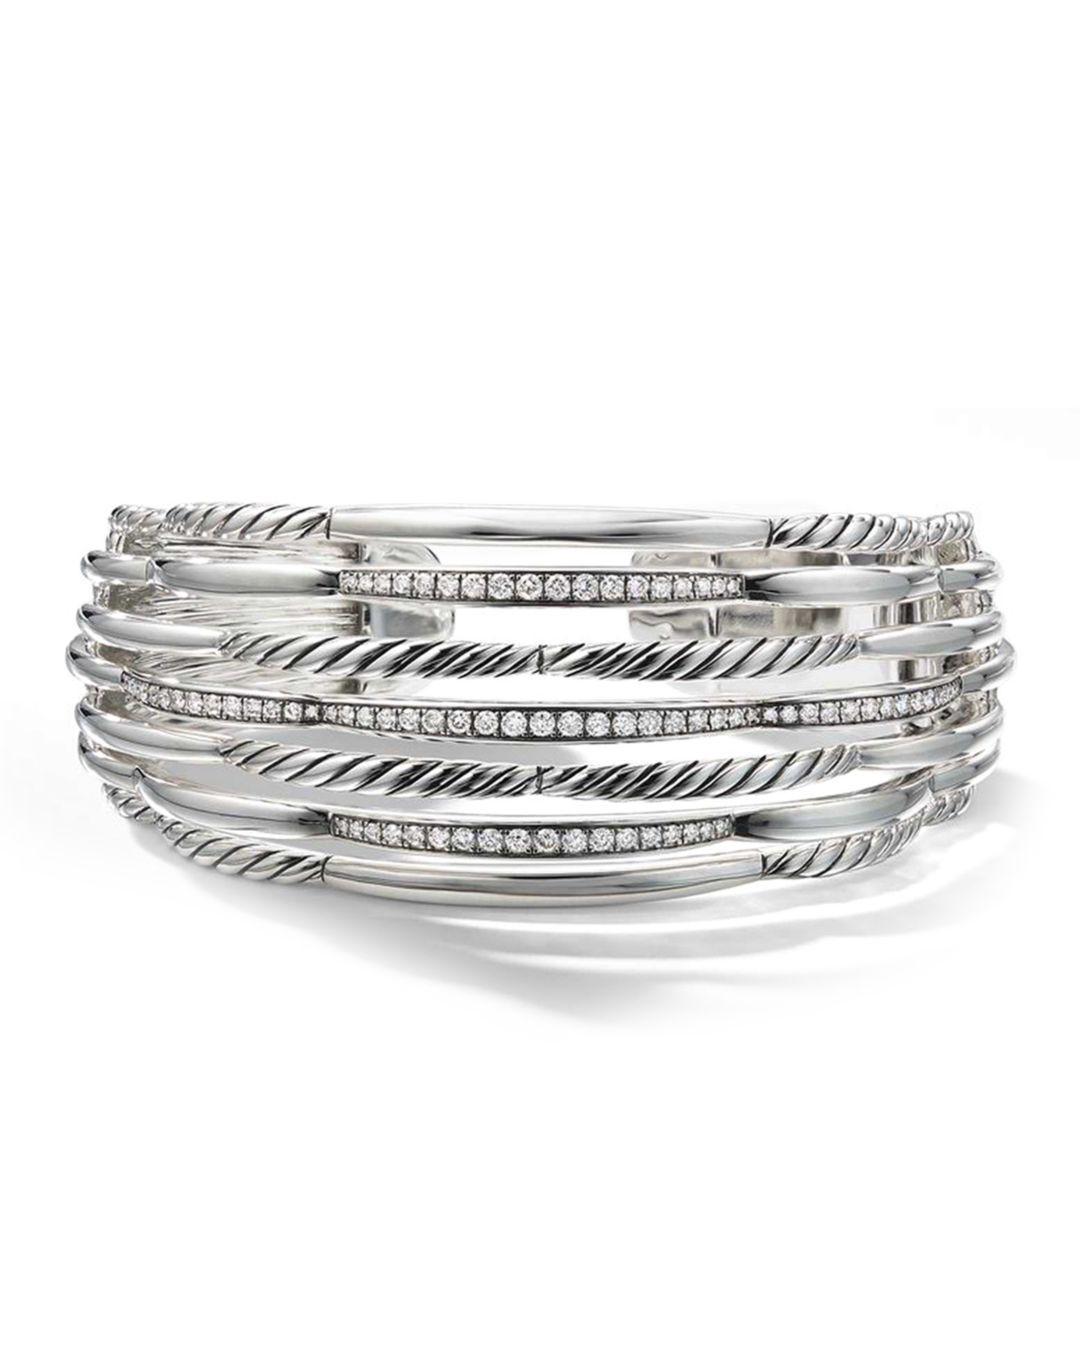 982c340dc3d03 Lyst - David Yurman Tides Wide Woven Cuff With Diamonds   Sterling Silver  in Metallic